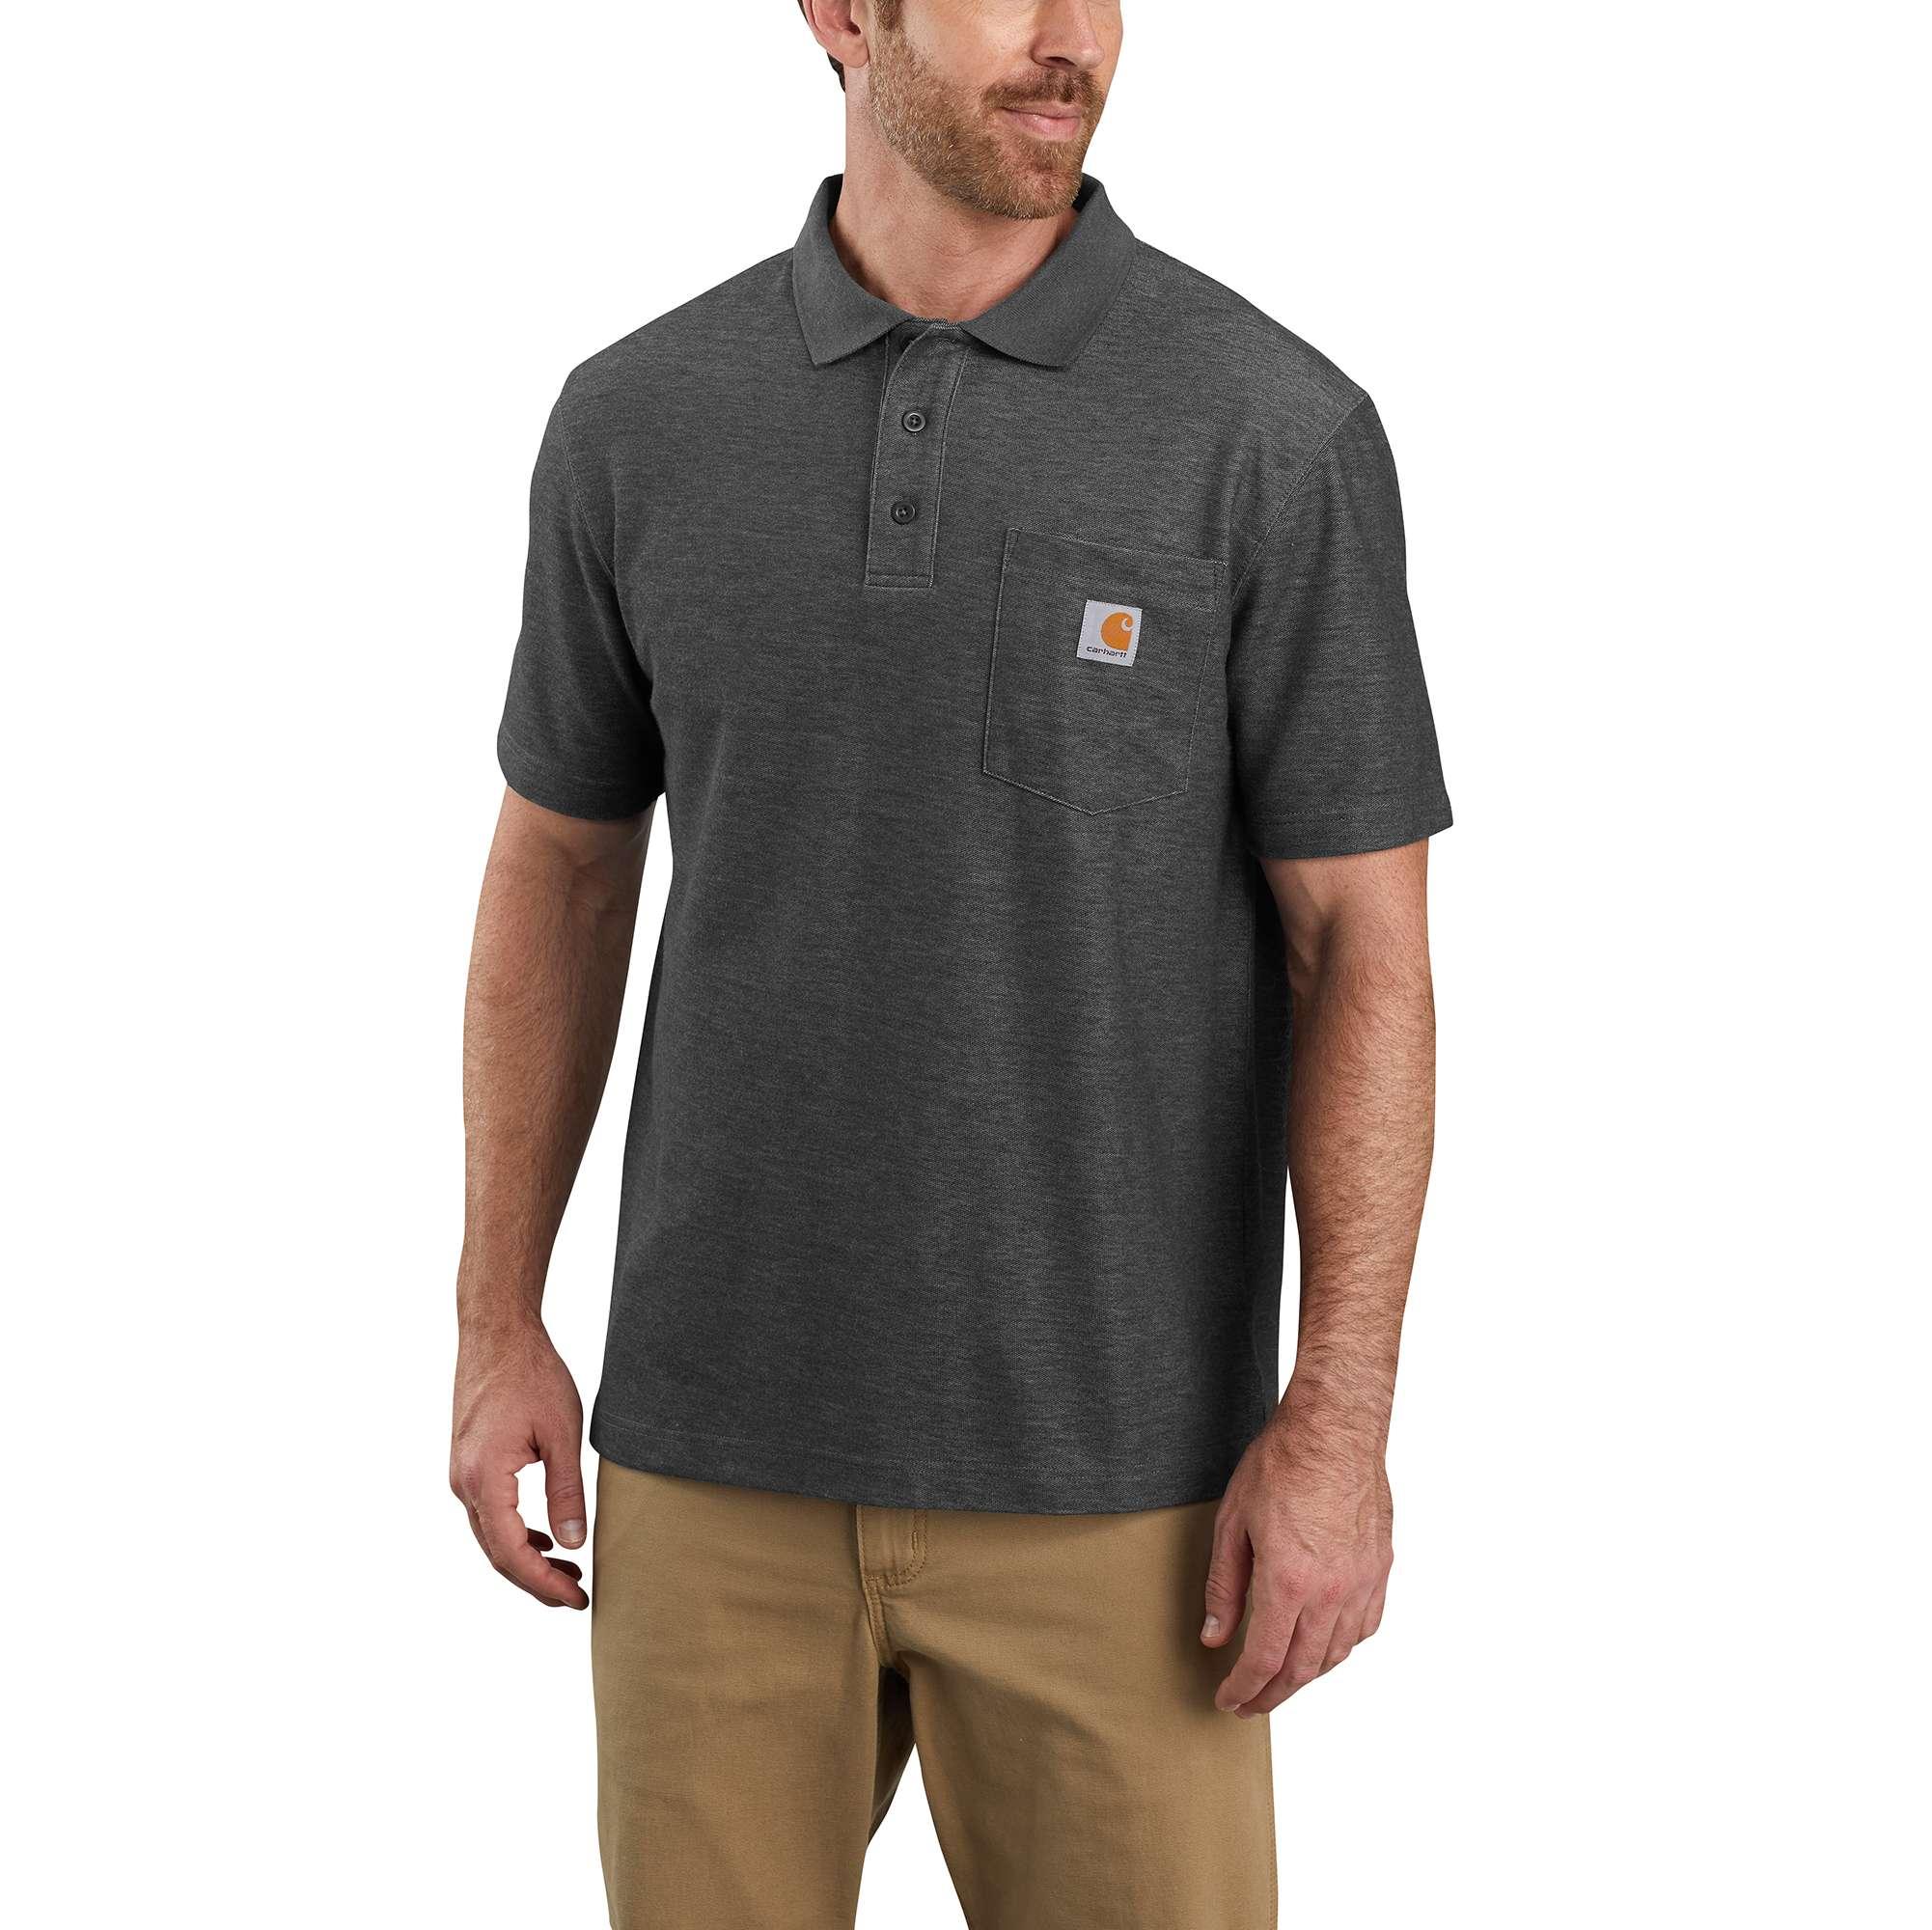 Men's Loose Fit Midweight Short-Sleeve Pocket Polo K570   Carhartt